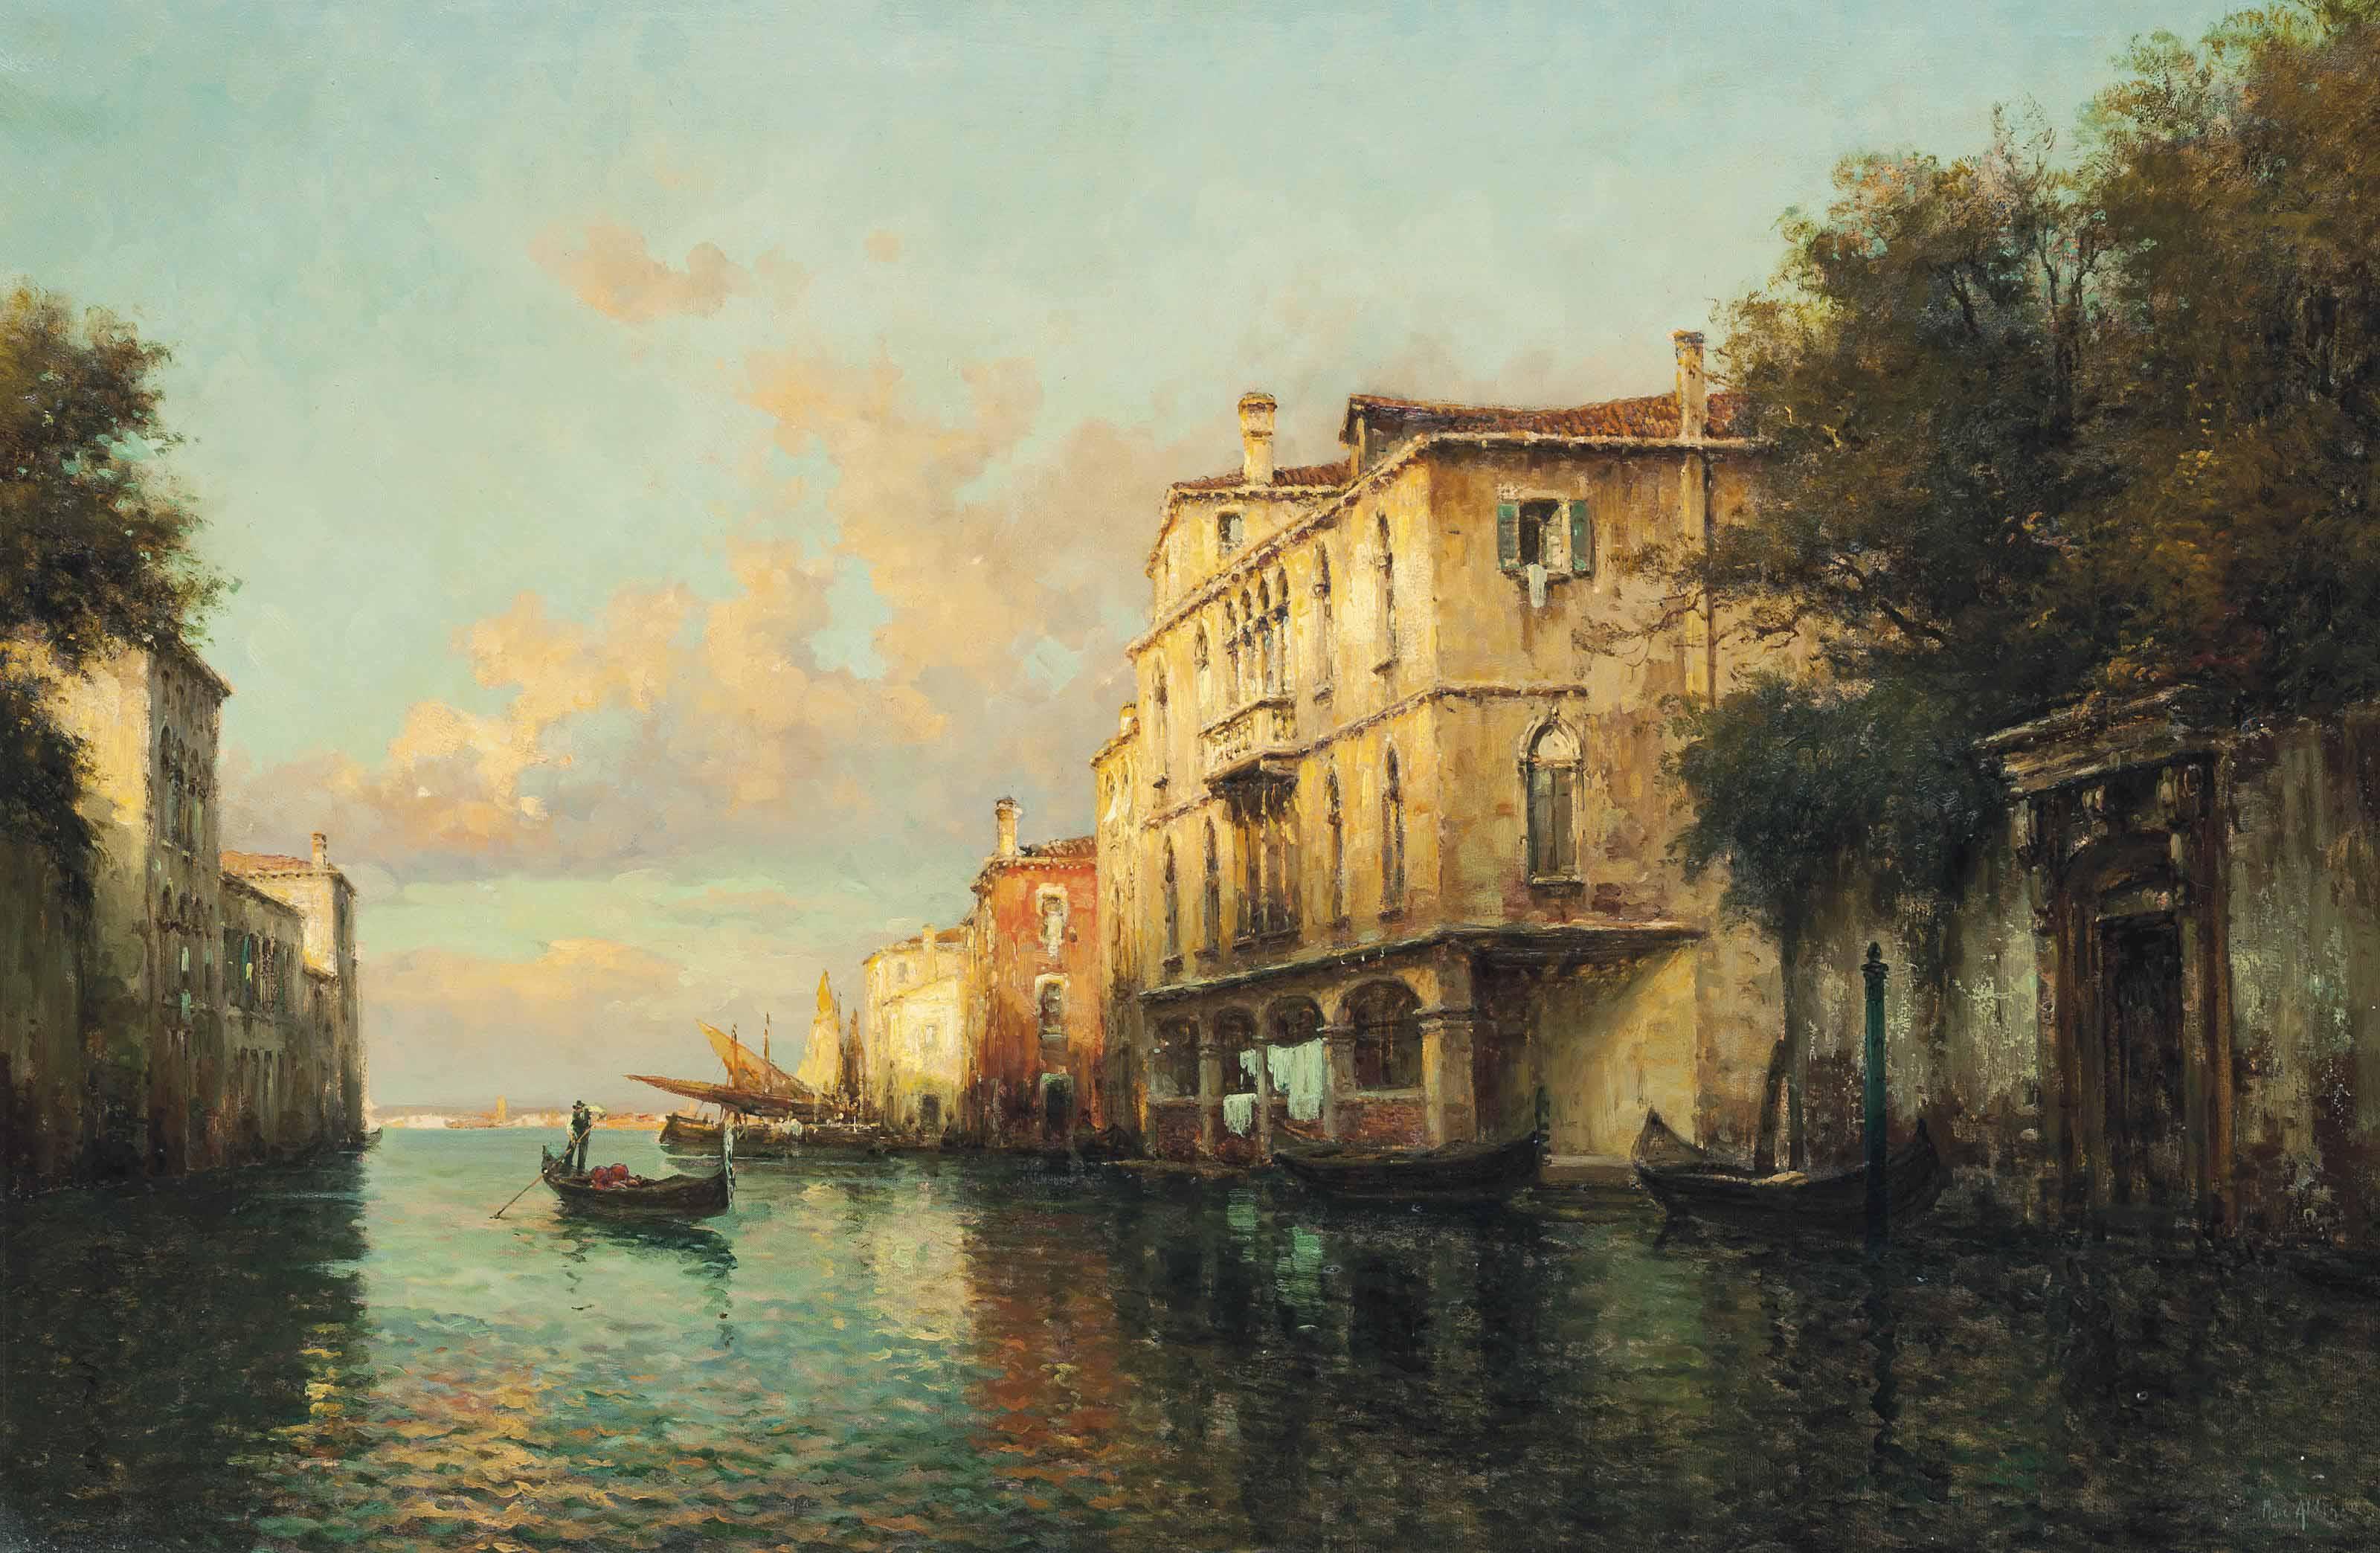 A gondola on a Venetian backwater